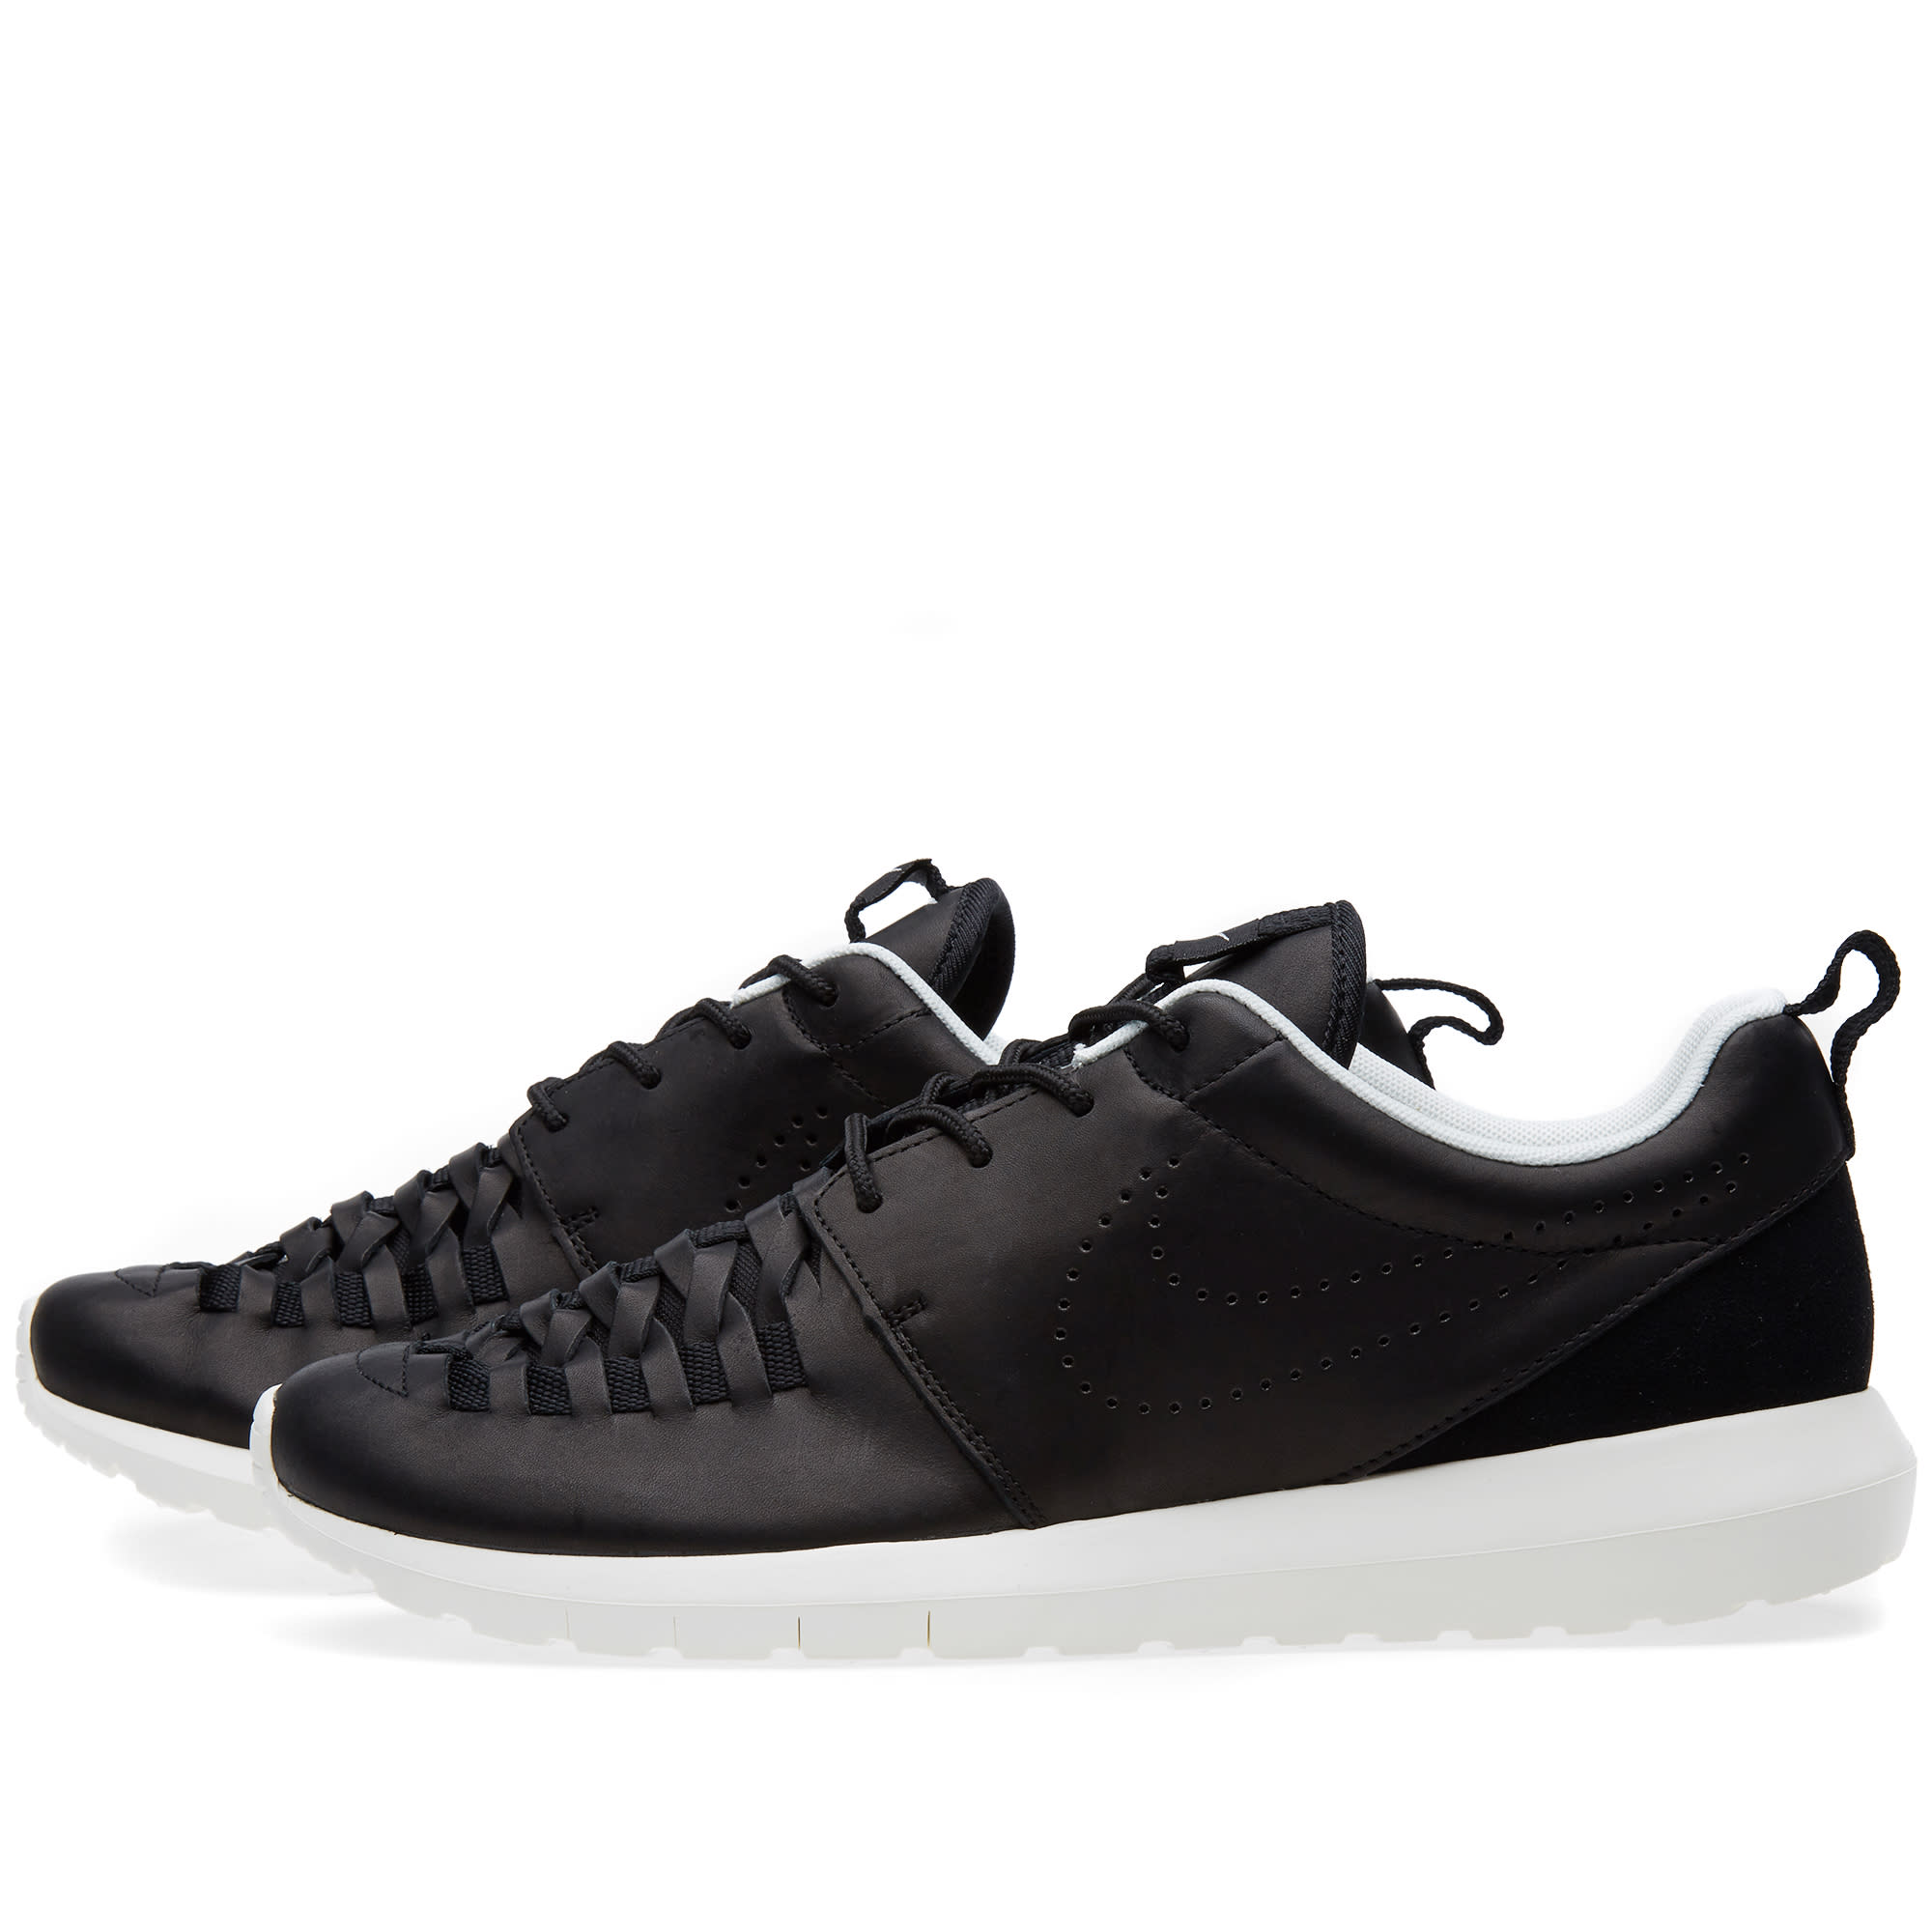 5a65b5a245377 Nike Roshe Run NM Woven Black   Sail